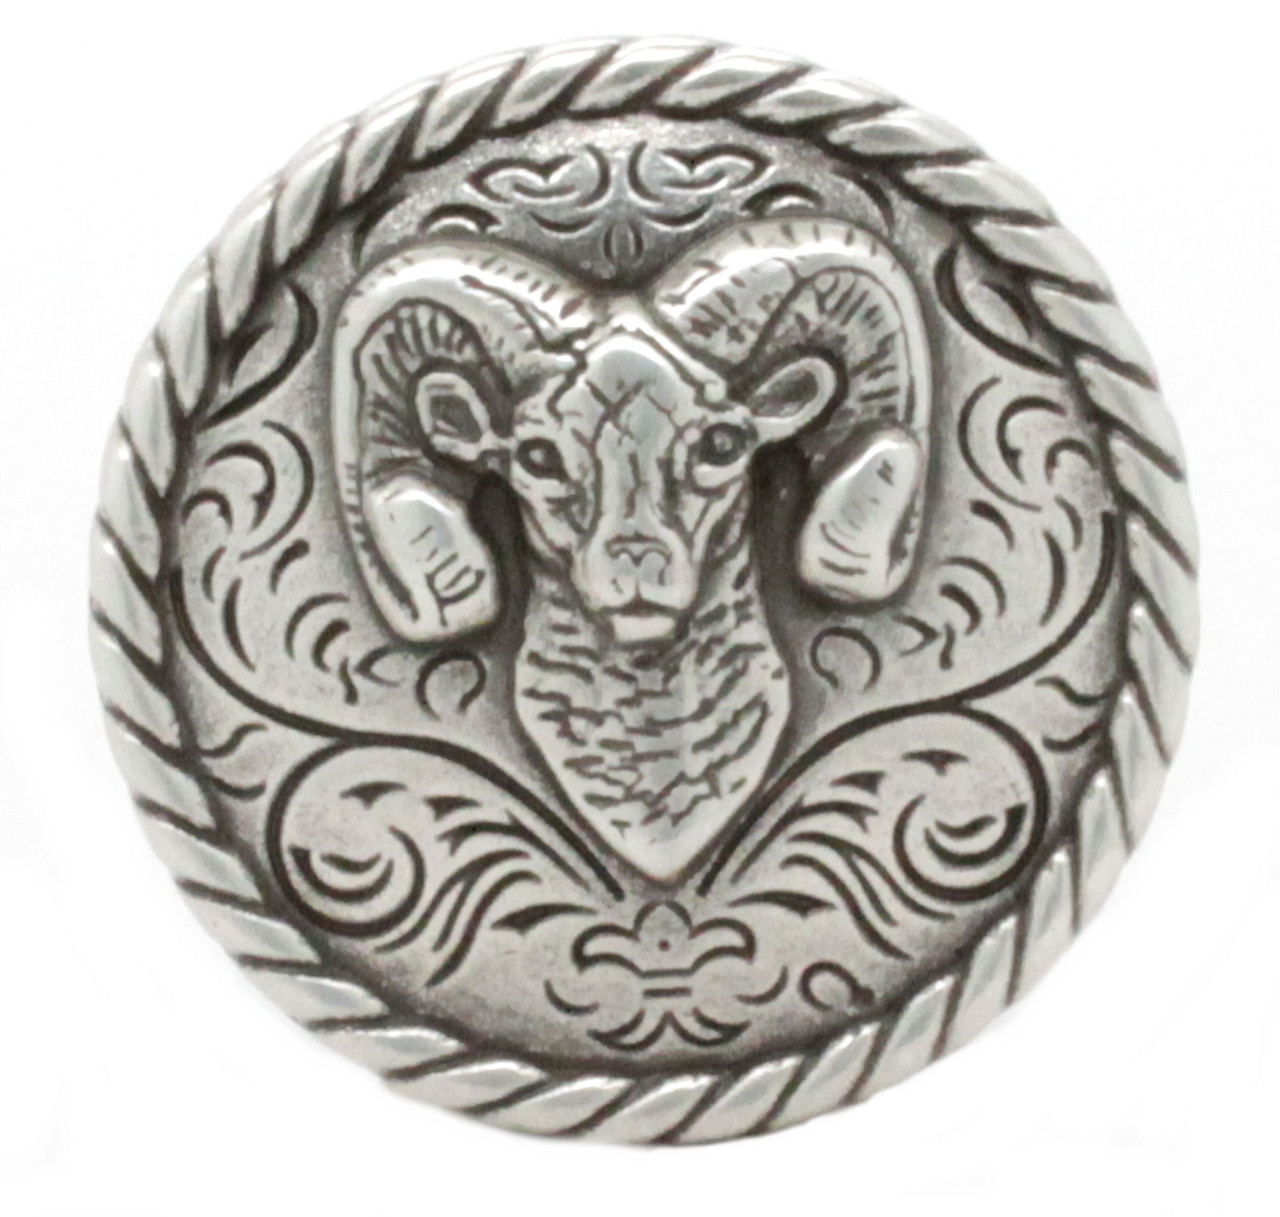 "Ram Concho Antique Silver 1-1/4"" Front"